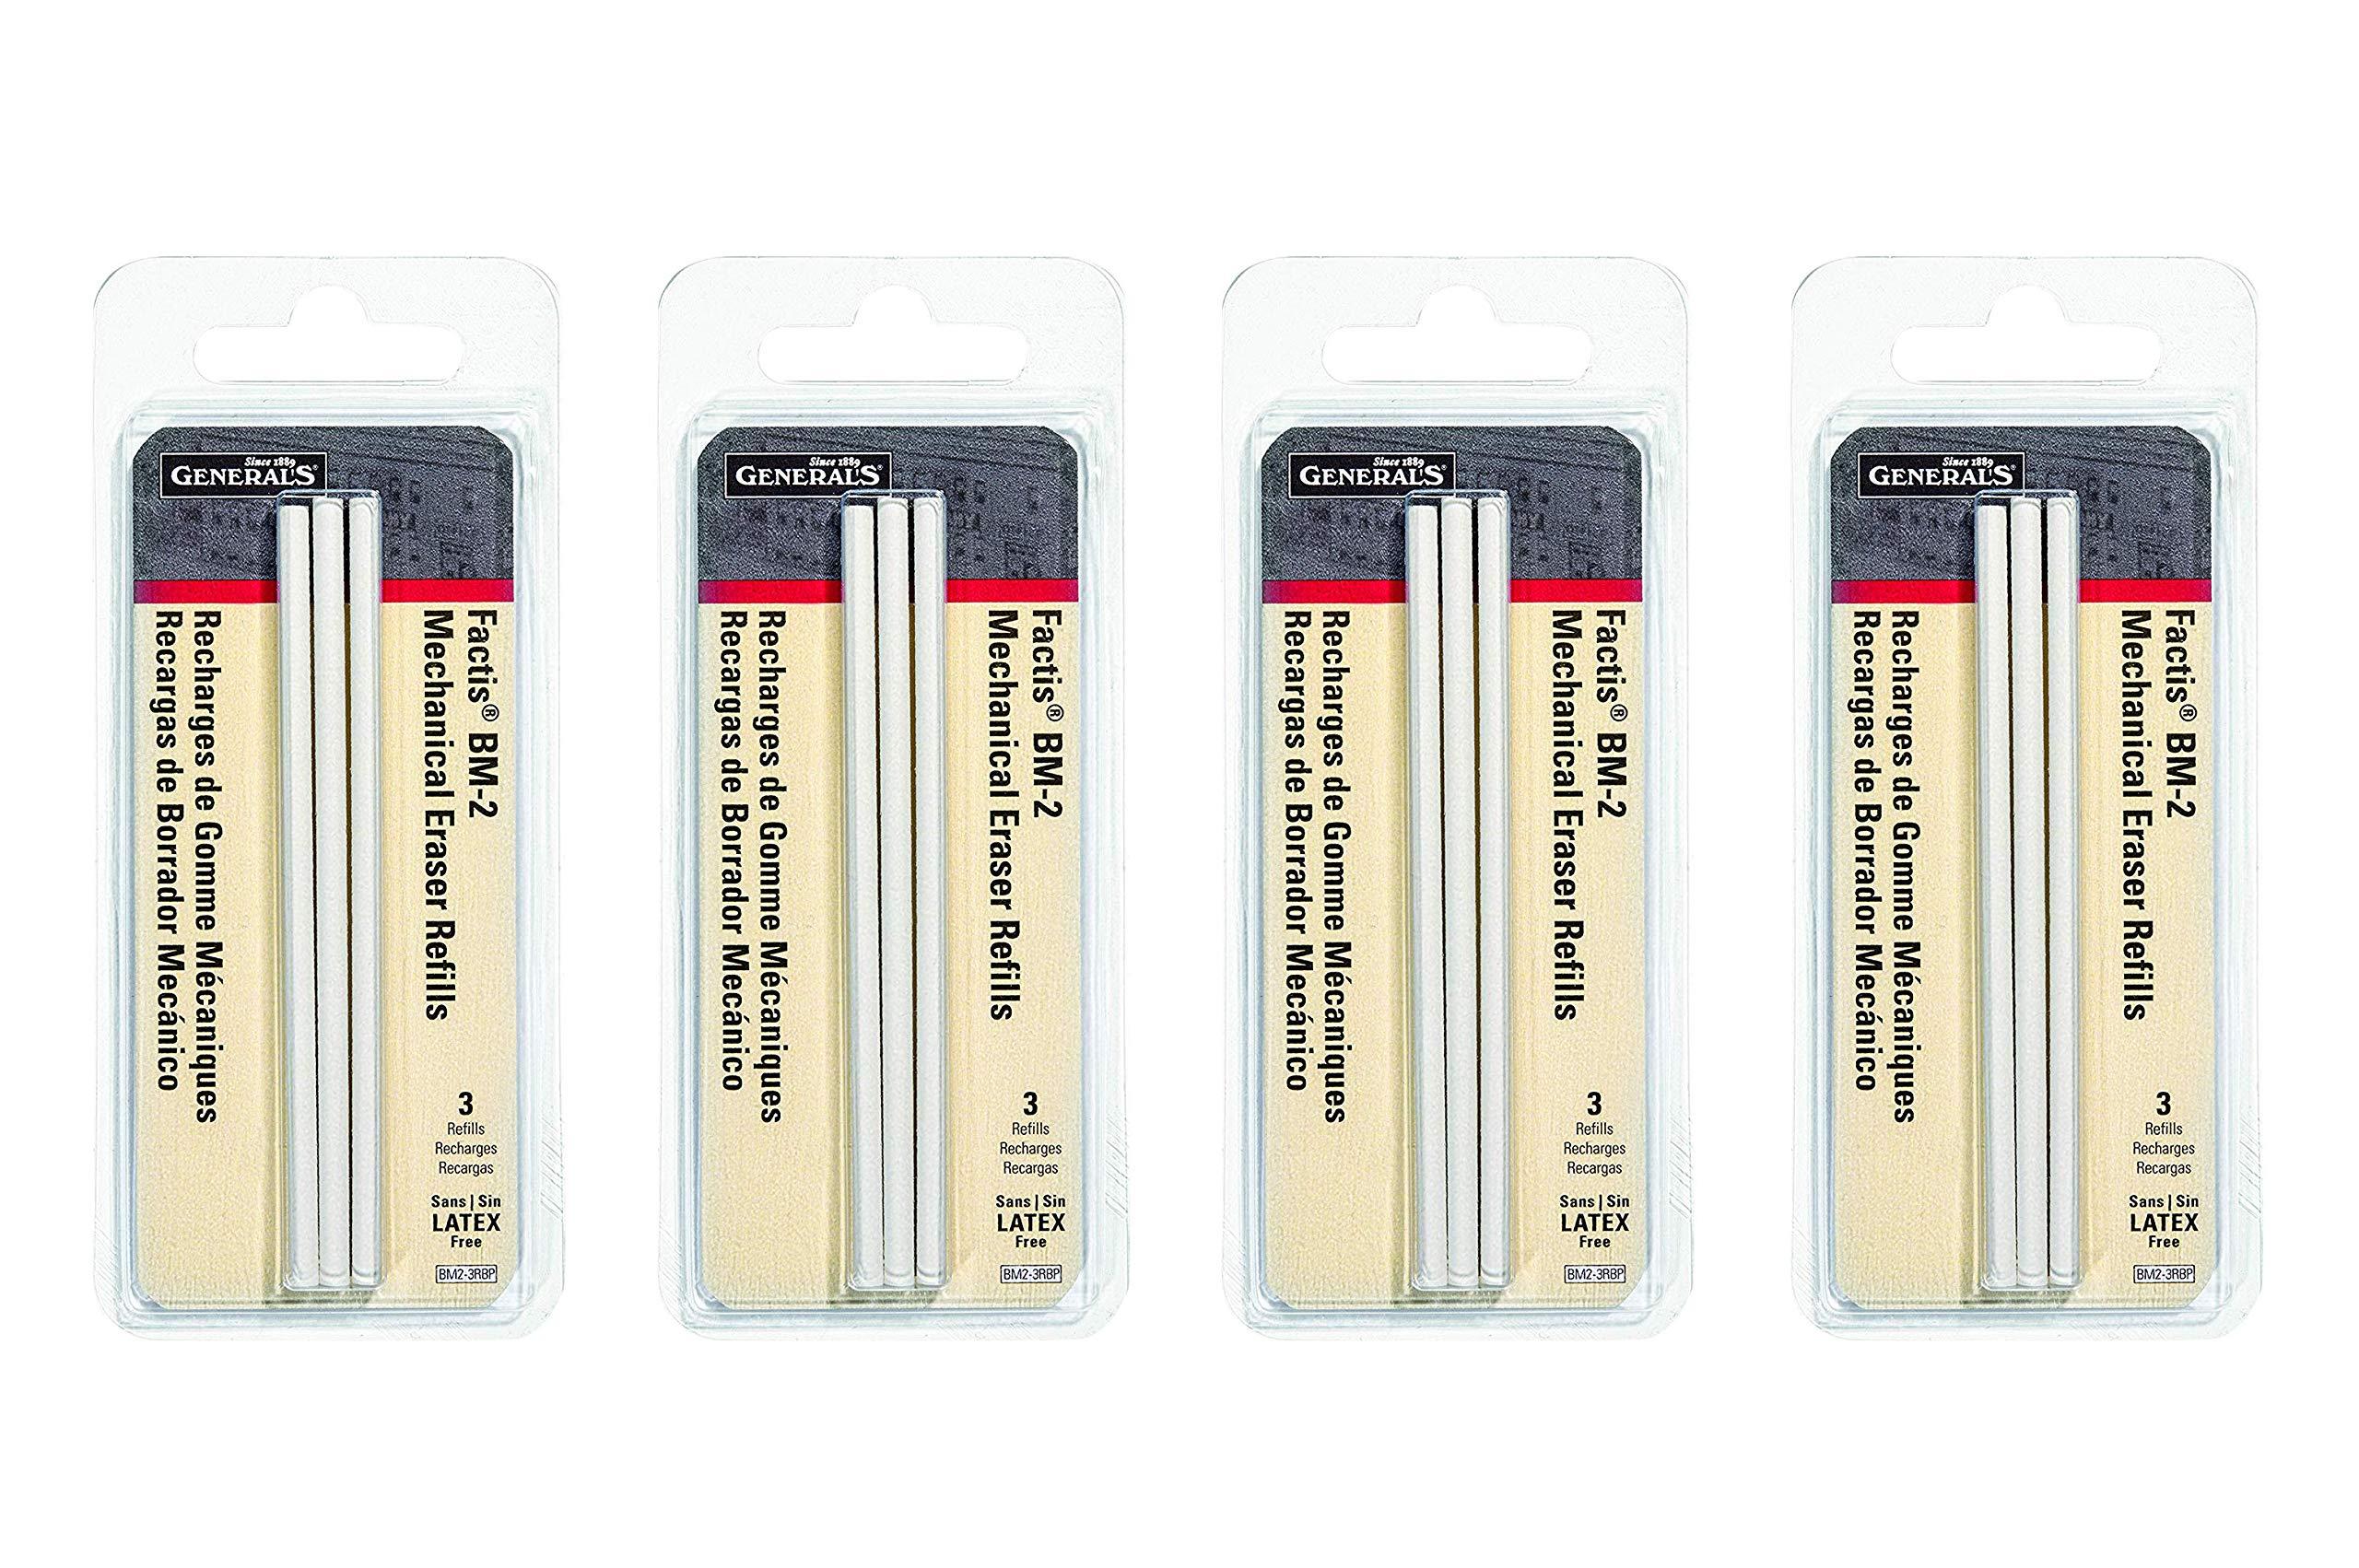 General Pencil CO. GPBM2-3RBP Factis Pen Style Eraser Refills 3Pcs Carded (Fоur Paсk)